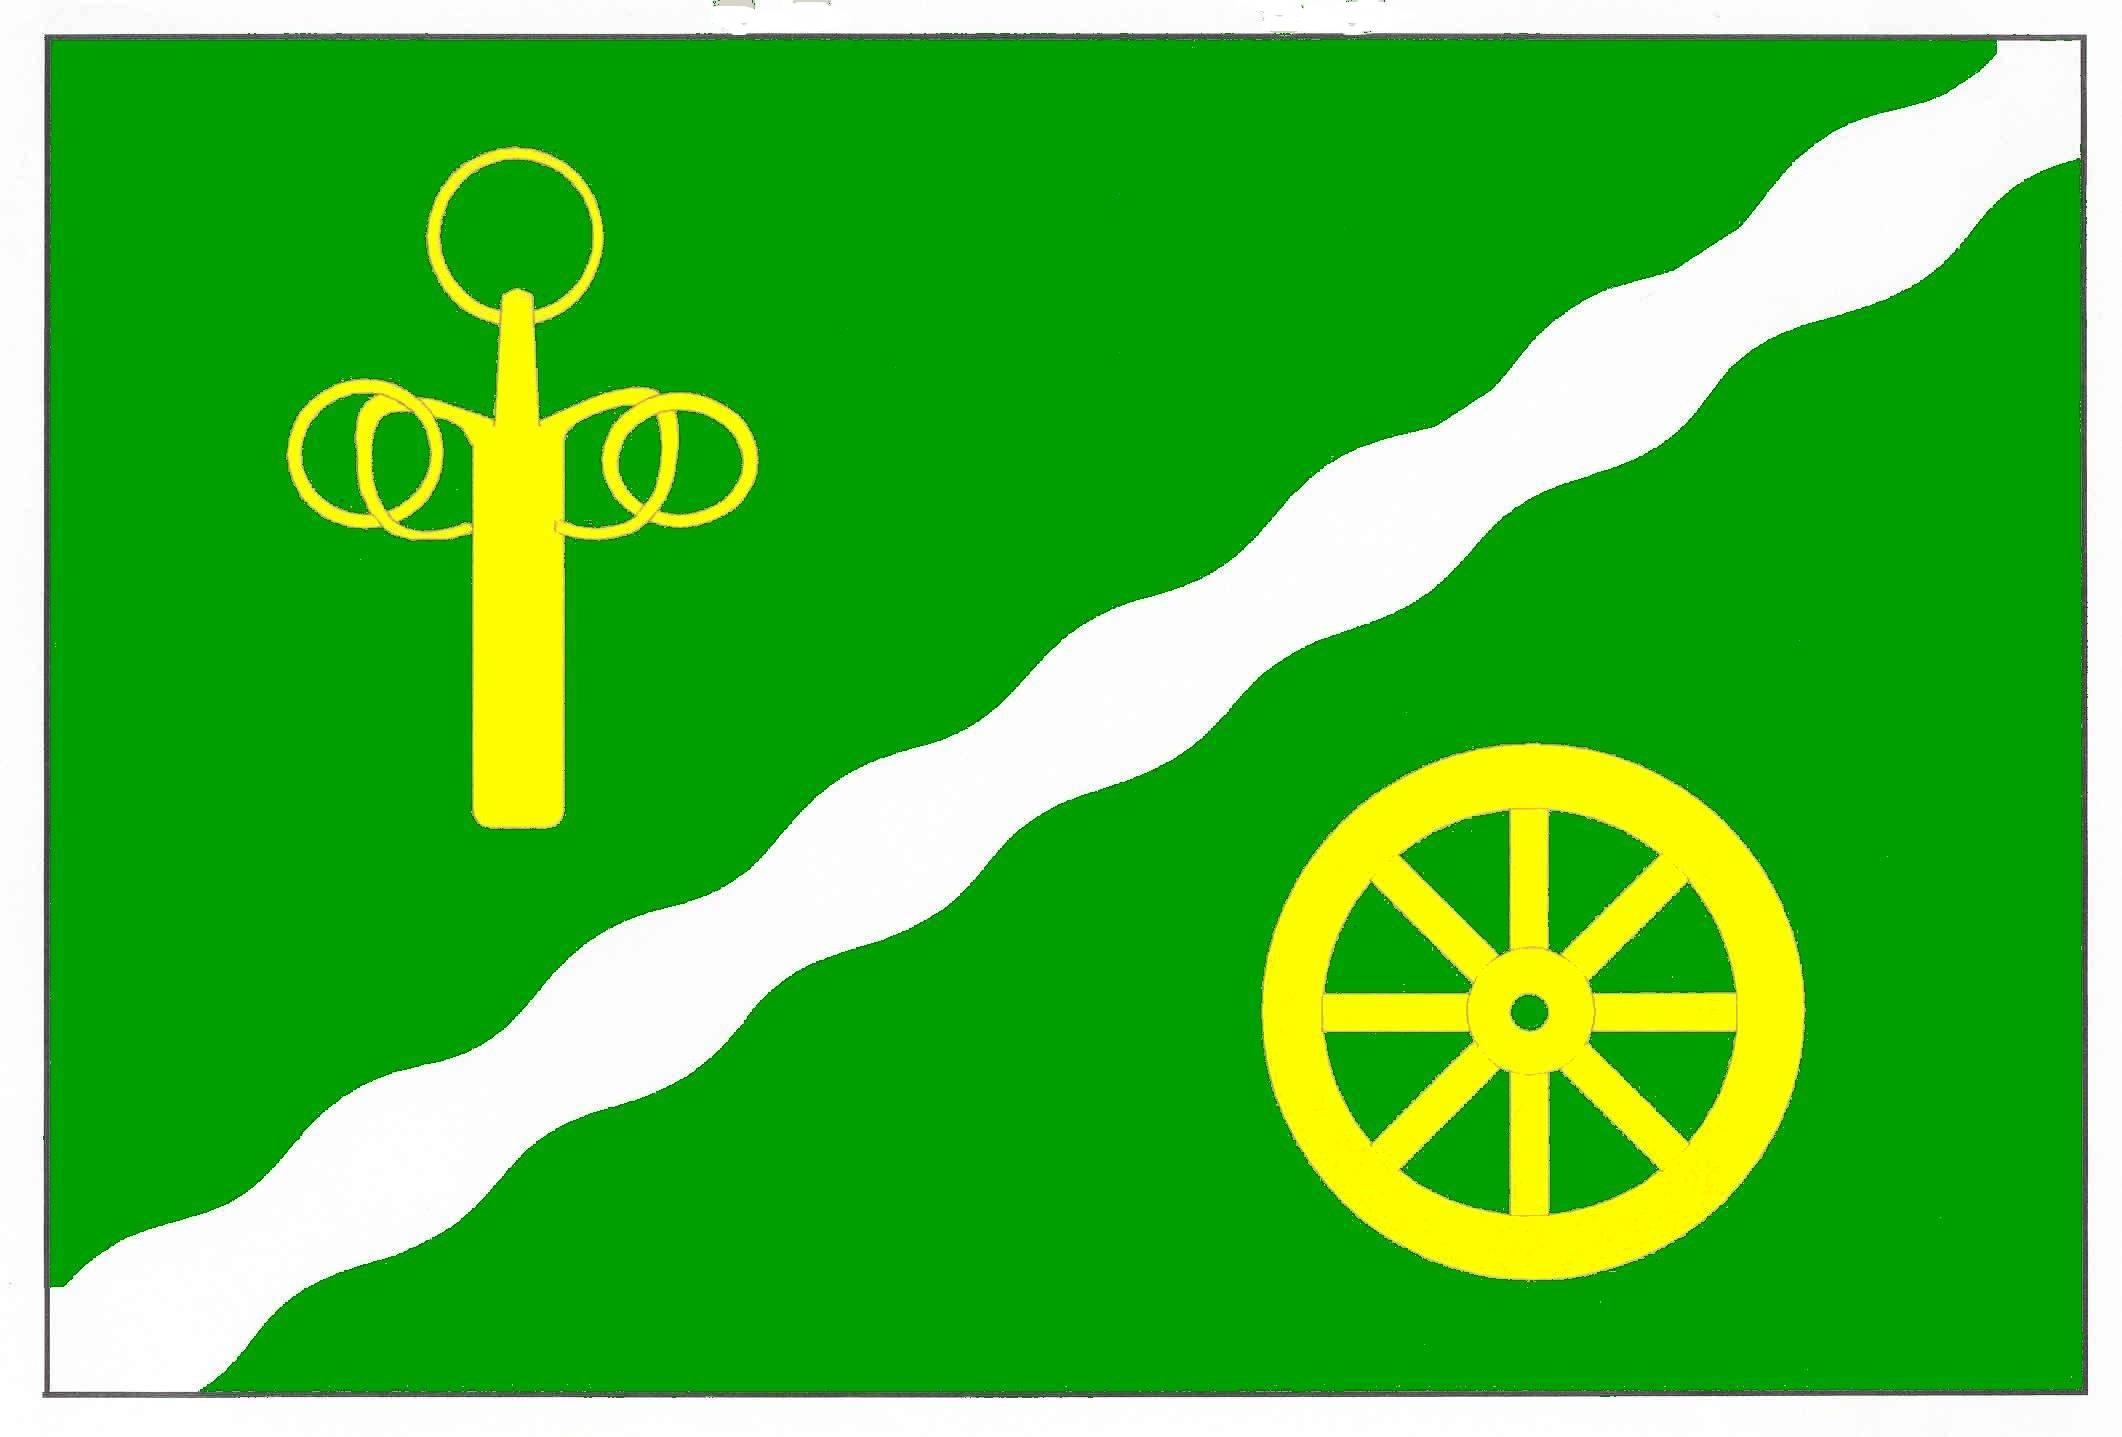 Flagge GemeindeBorgstedt, Kreis Rendsburg-Eckernförde